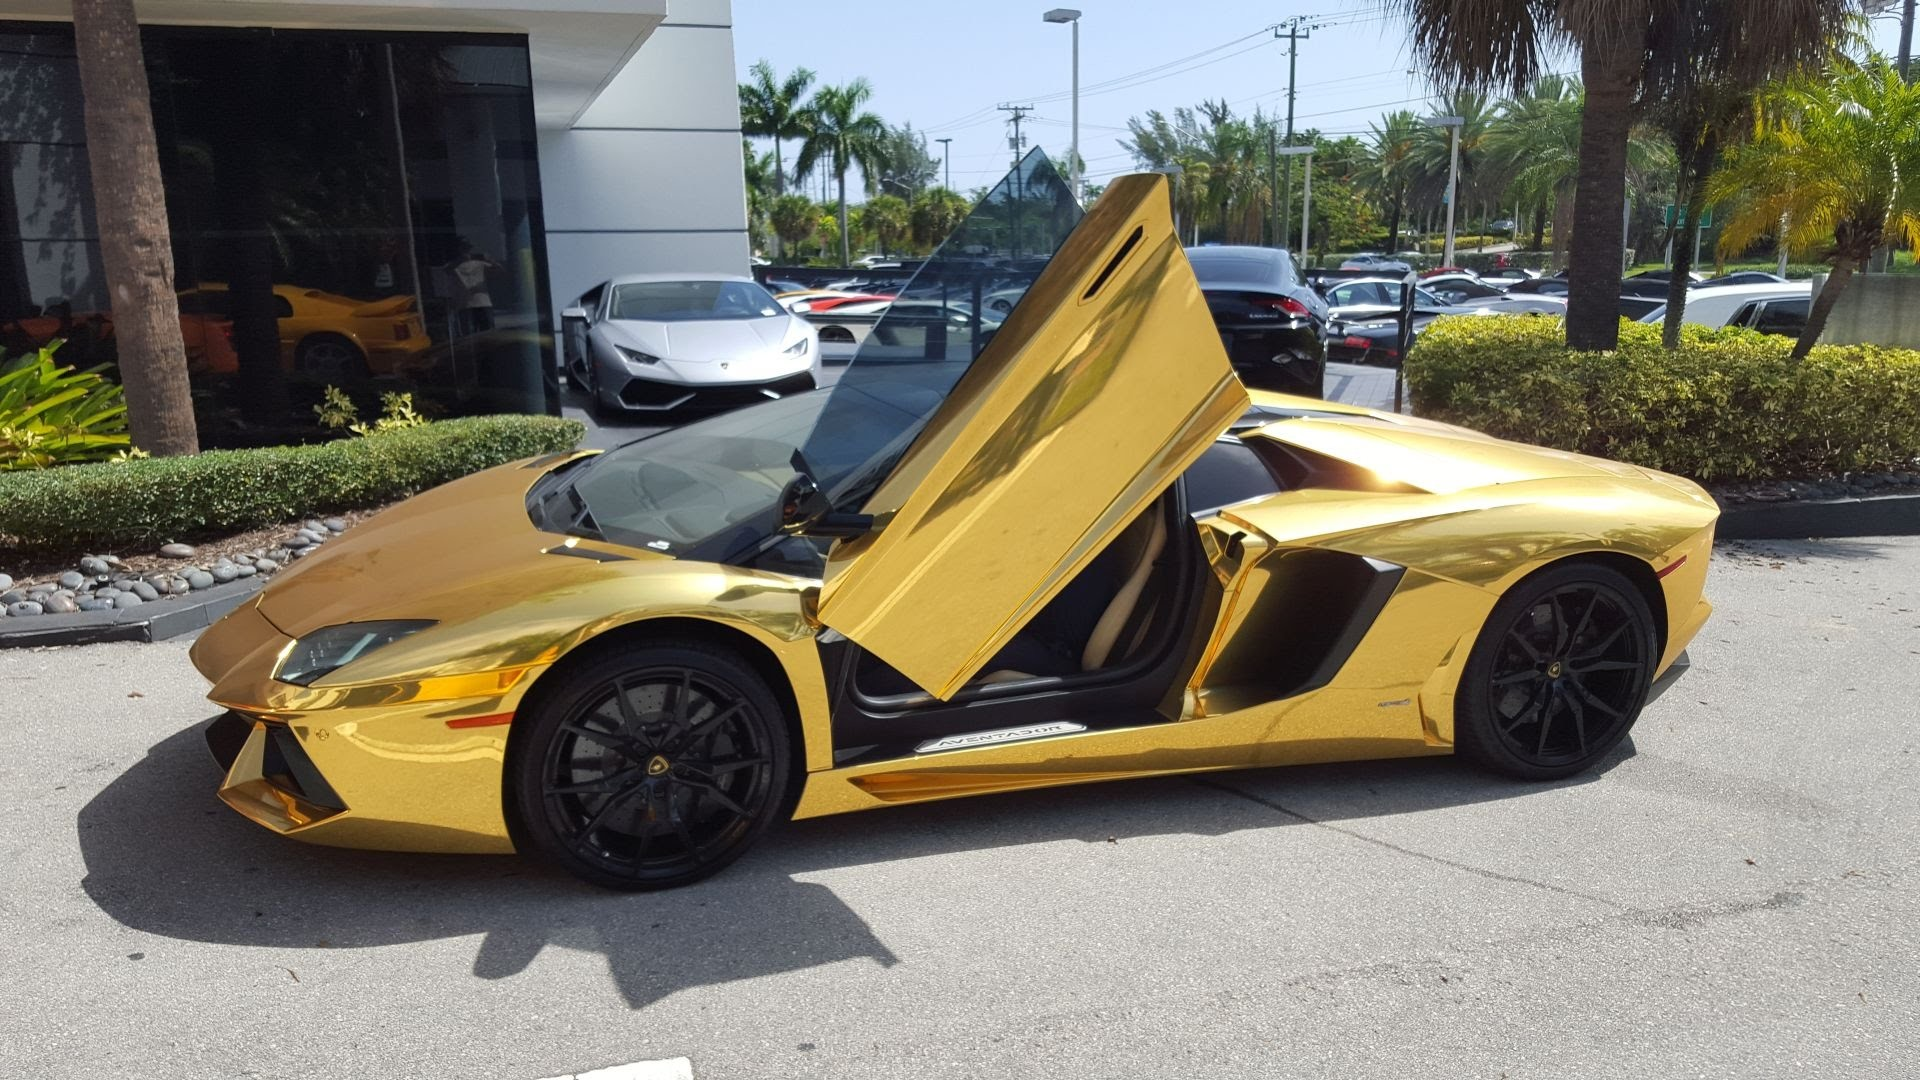 Res: 1920x1080, Download Original Size. ,. Lamborghini Veneno Gold Edition HD desktop  wallpaper Widescreen ...